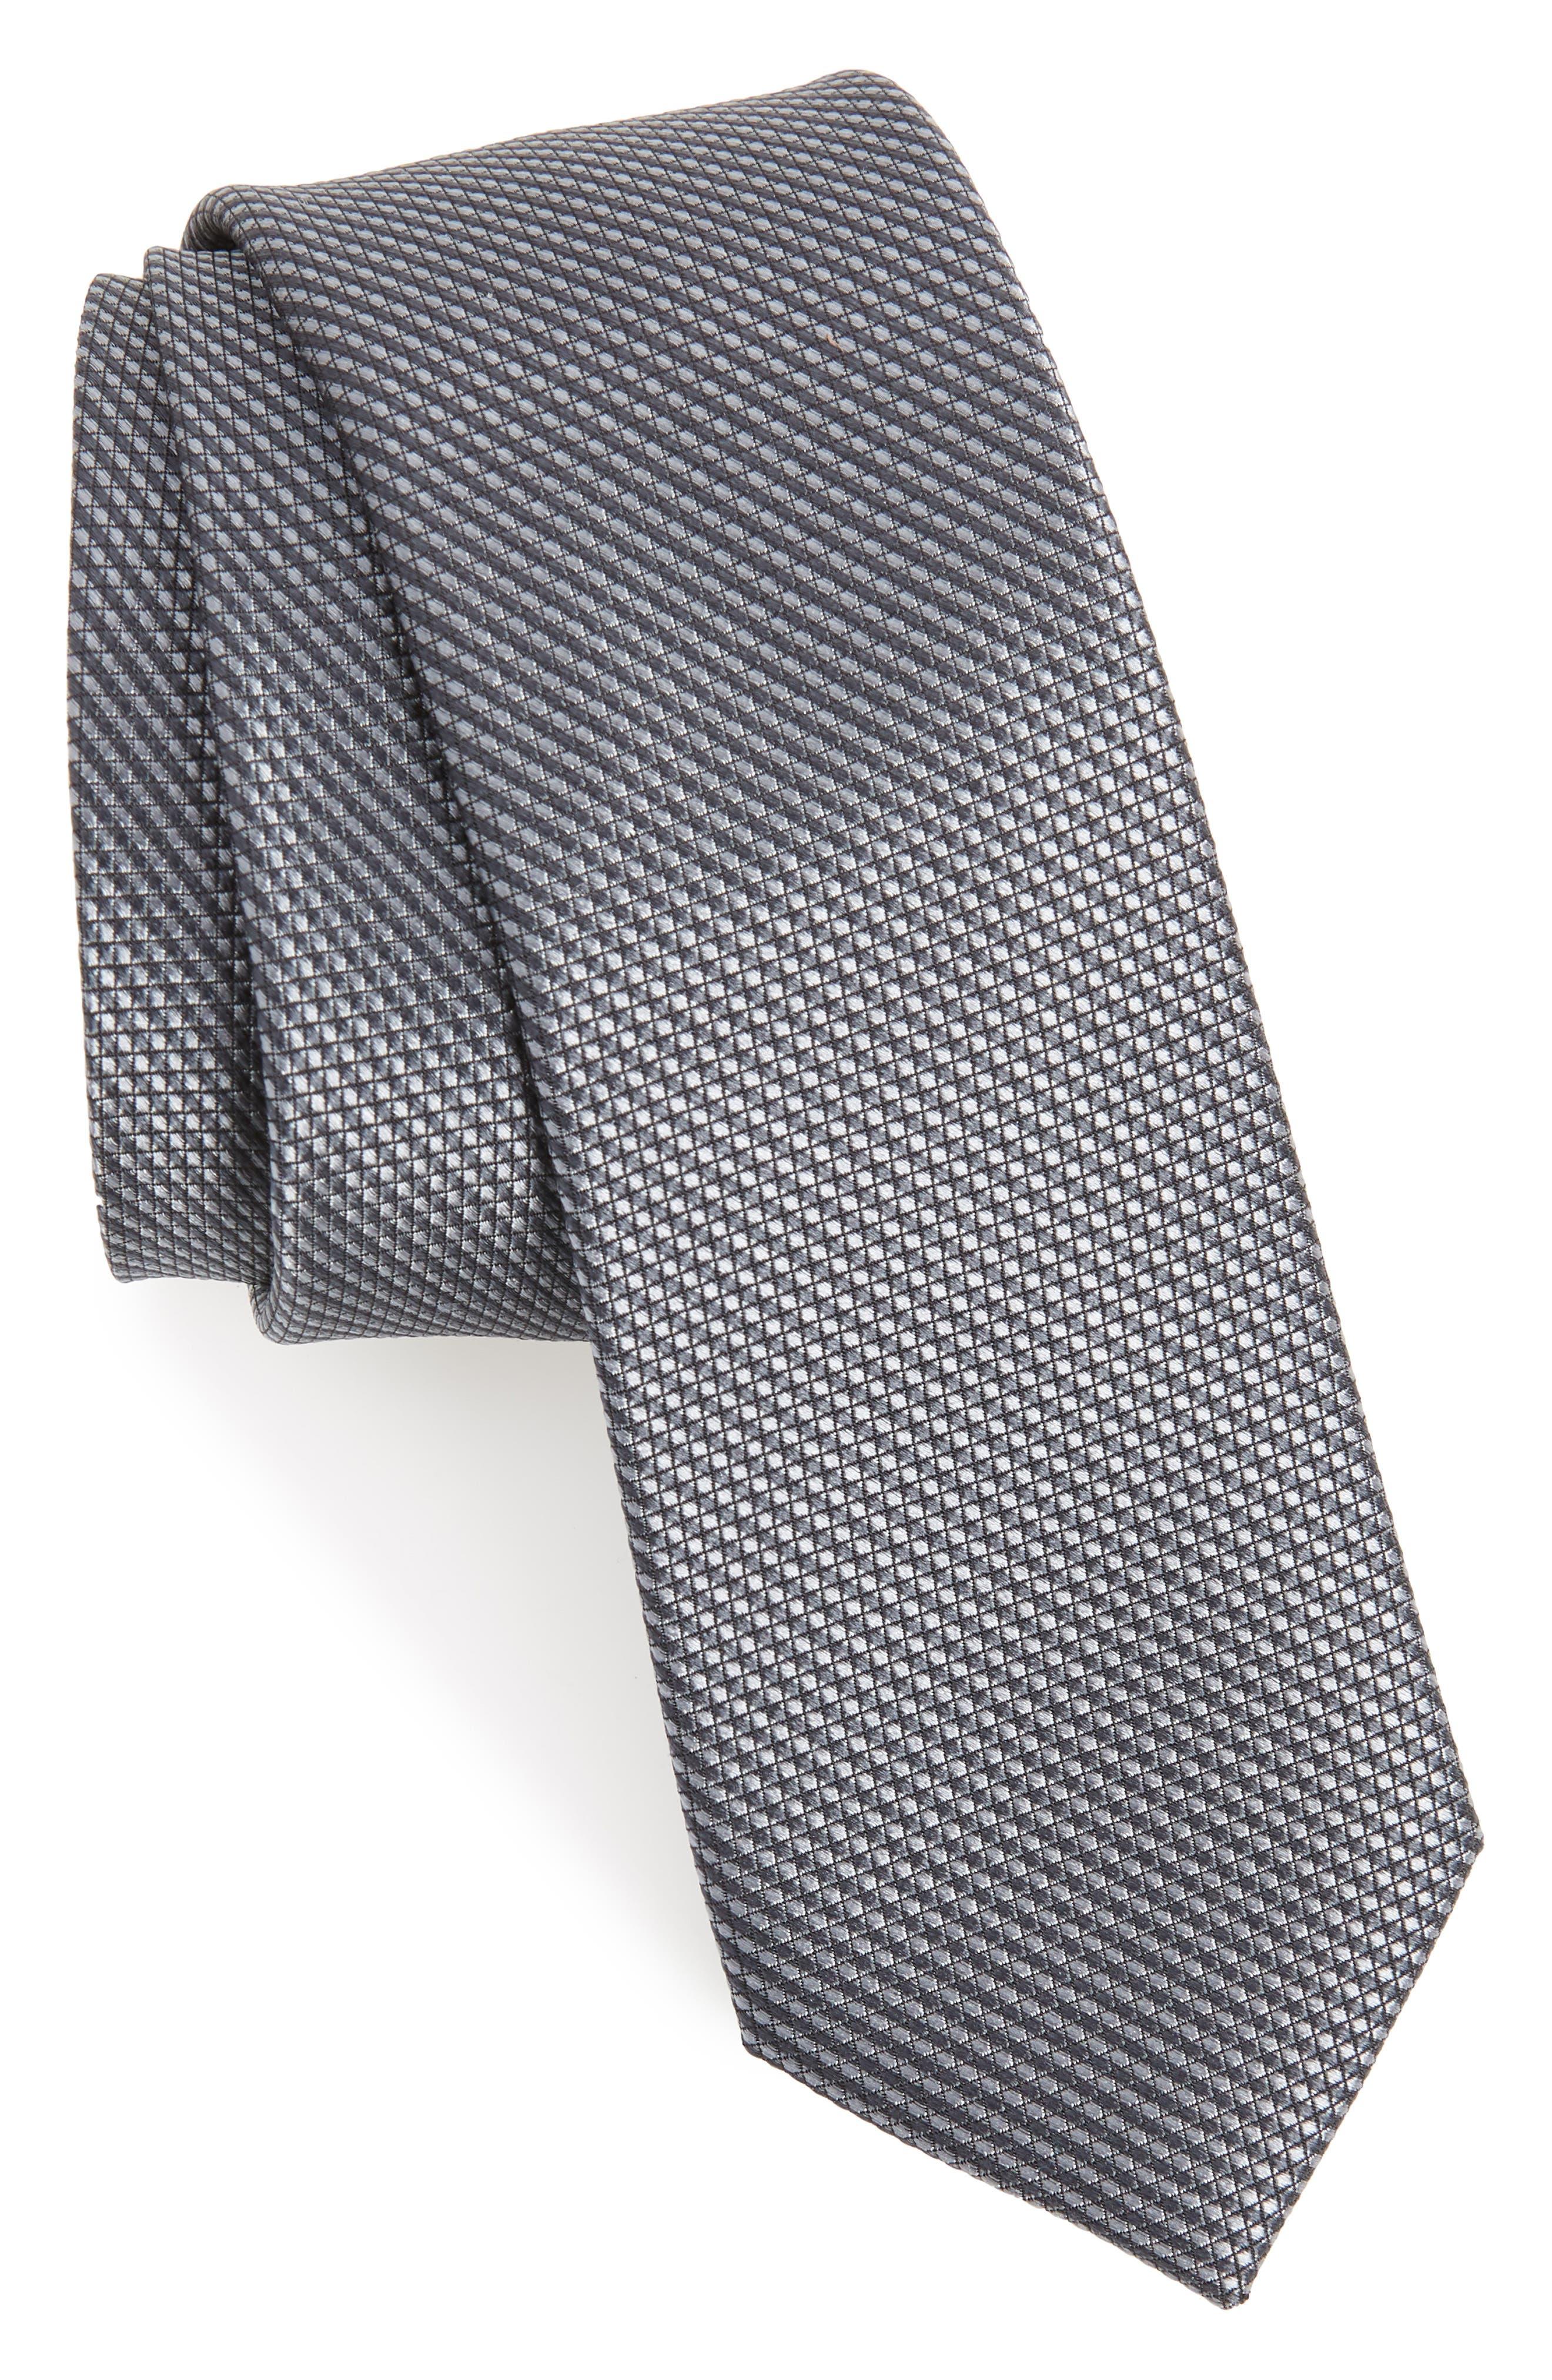 Solid Skinny Silk Tie,                             Main thumbnail 1, color,                             GREY